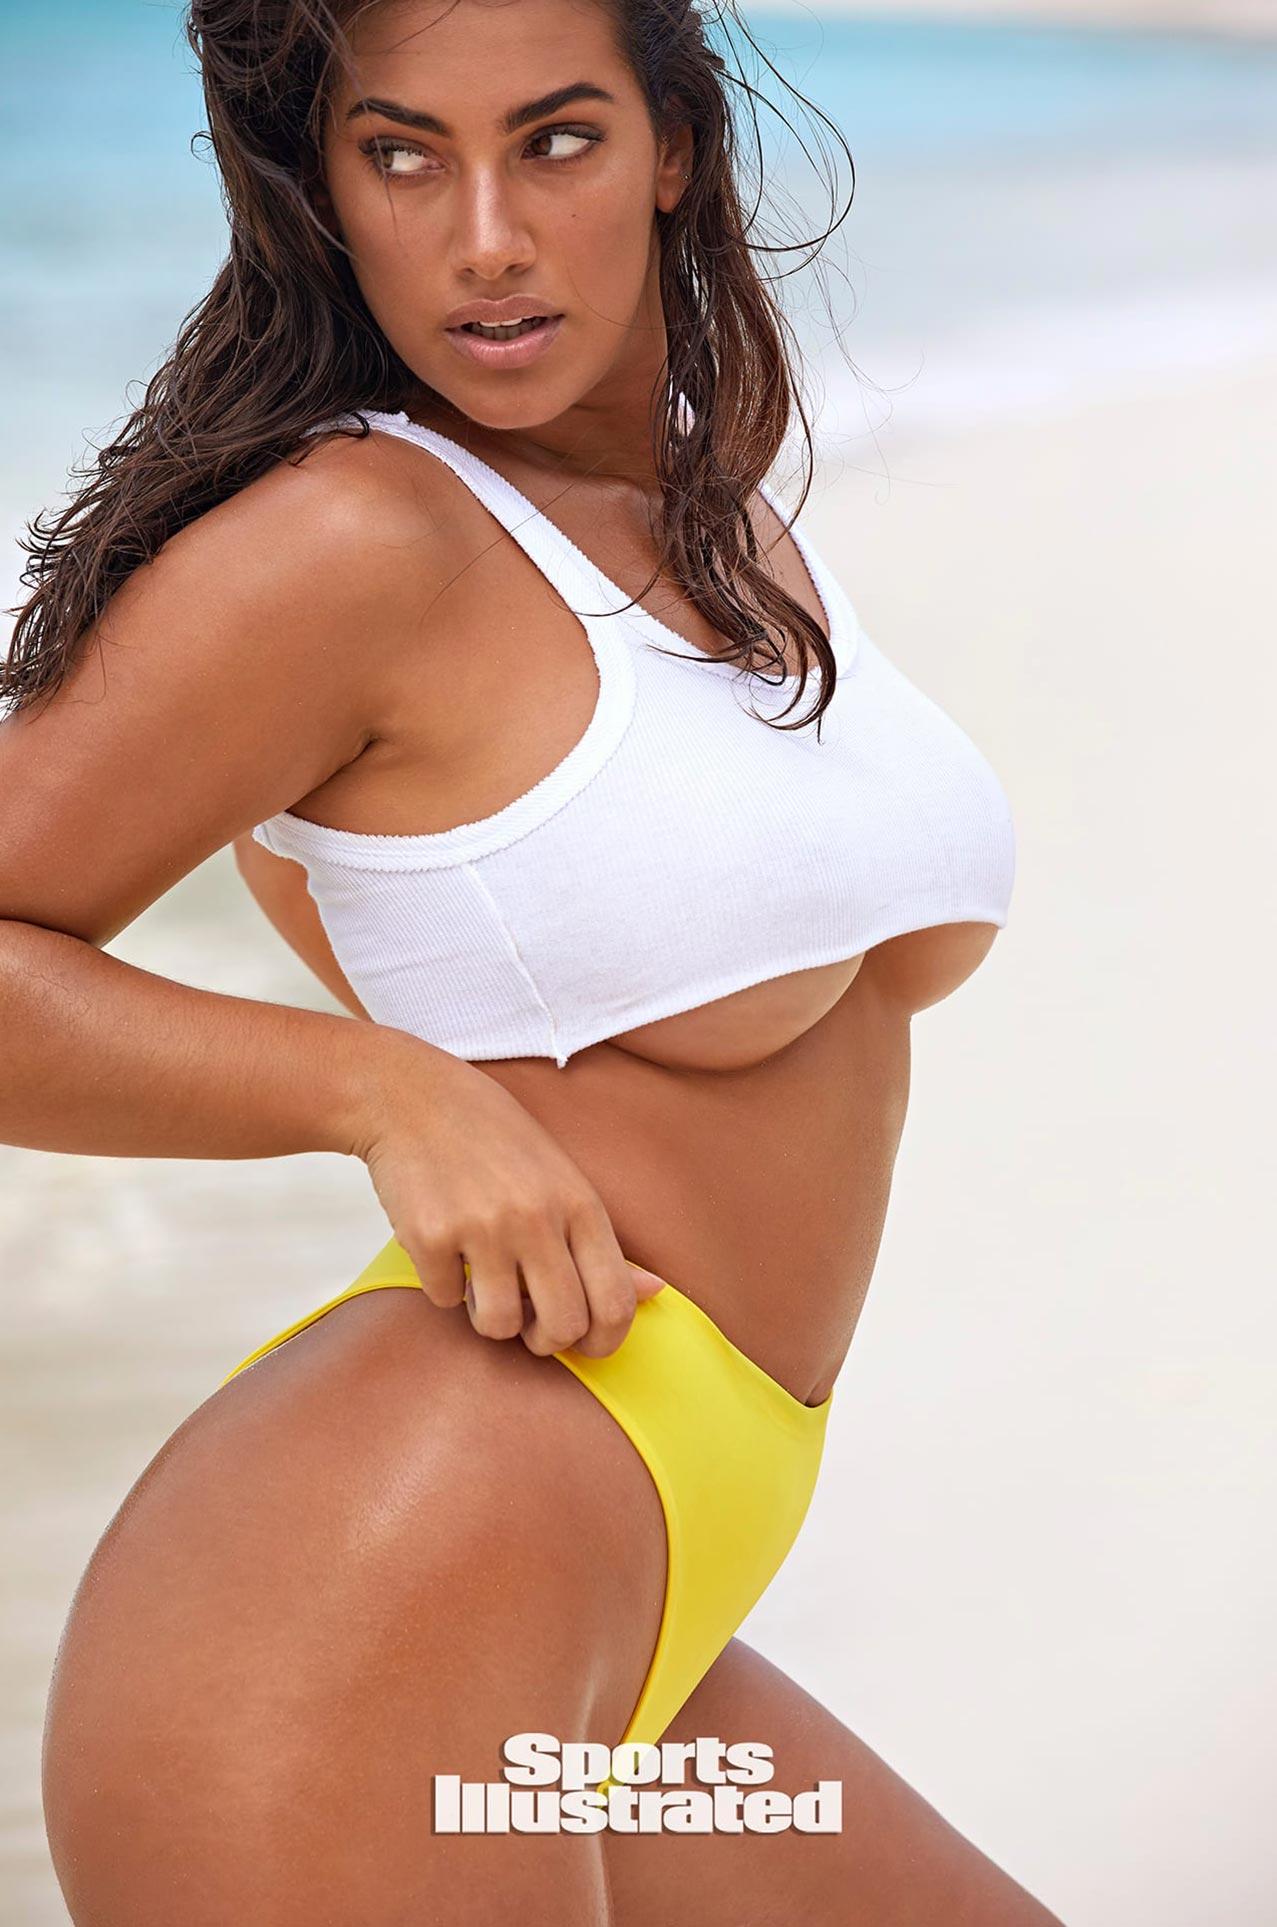 Лорена Дюран в каталоге купальников Sports Illustrated Swimsuit 2020 / фото 10